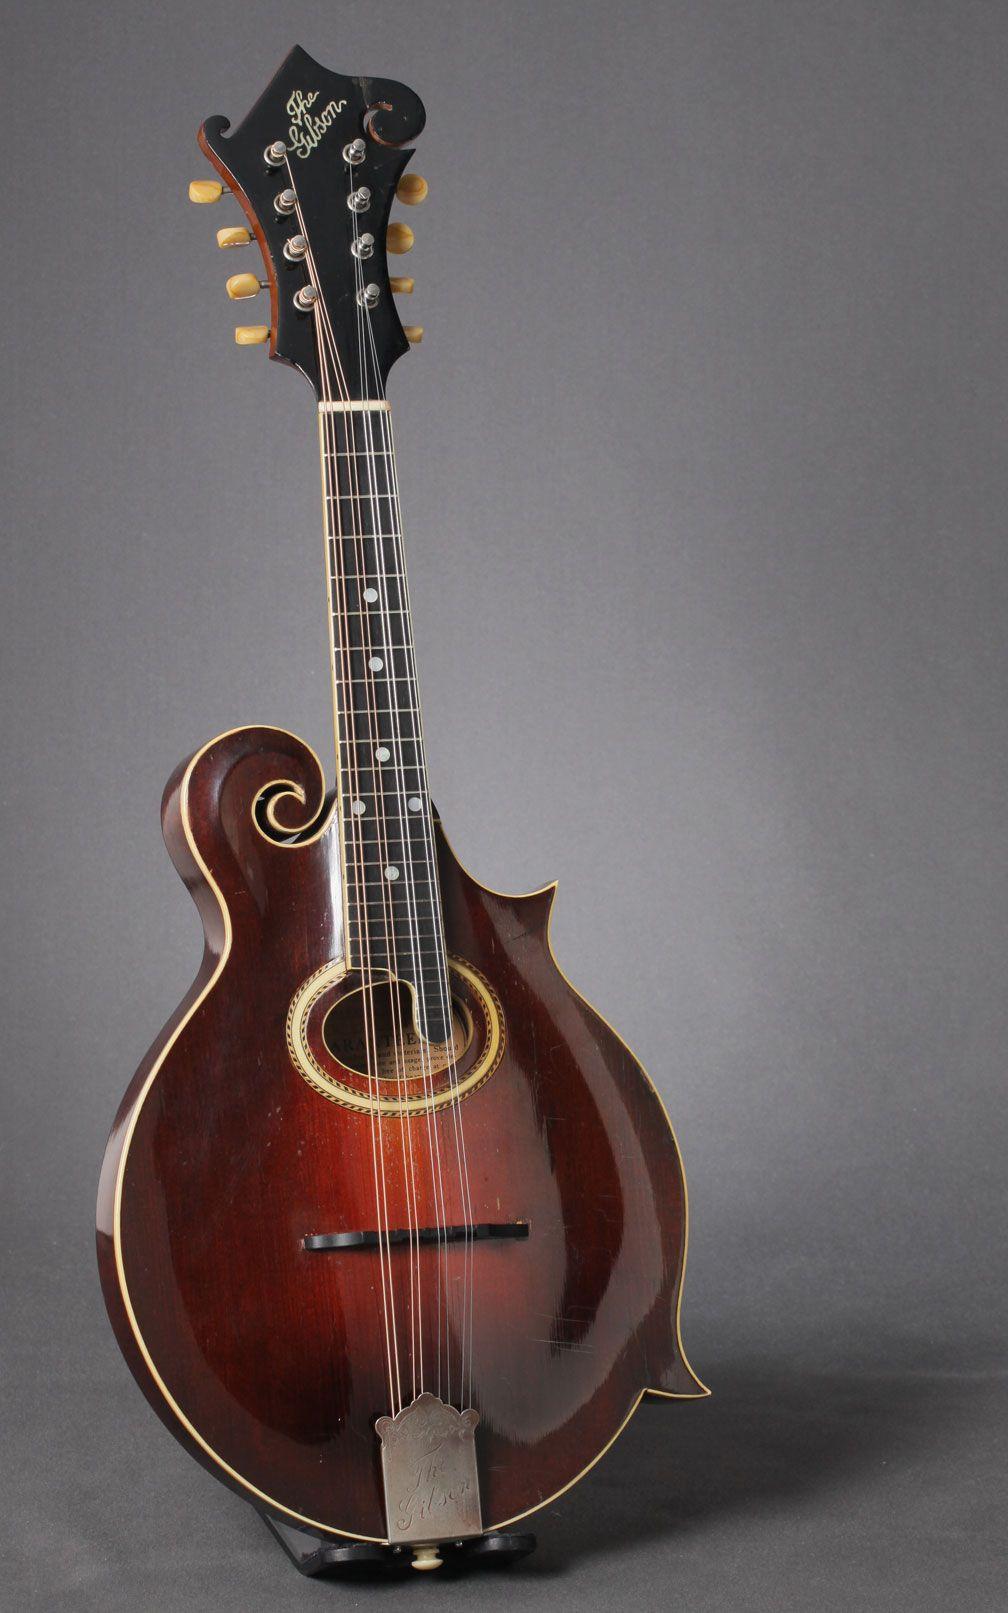 1920 Gibson F2 Mandolin